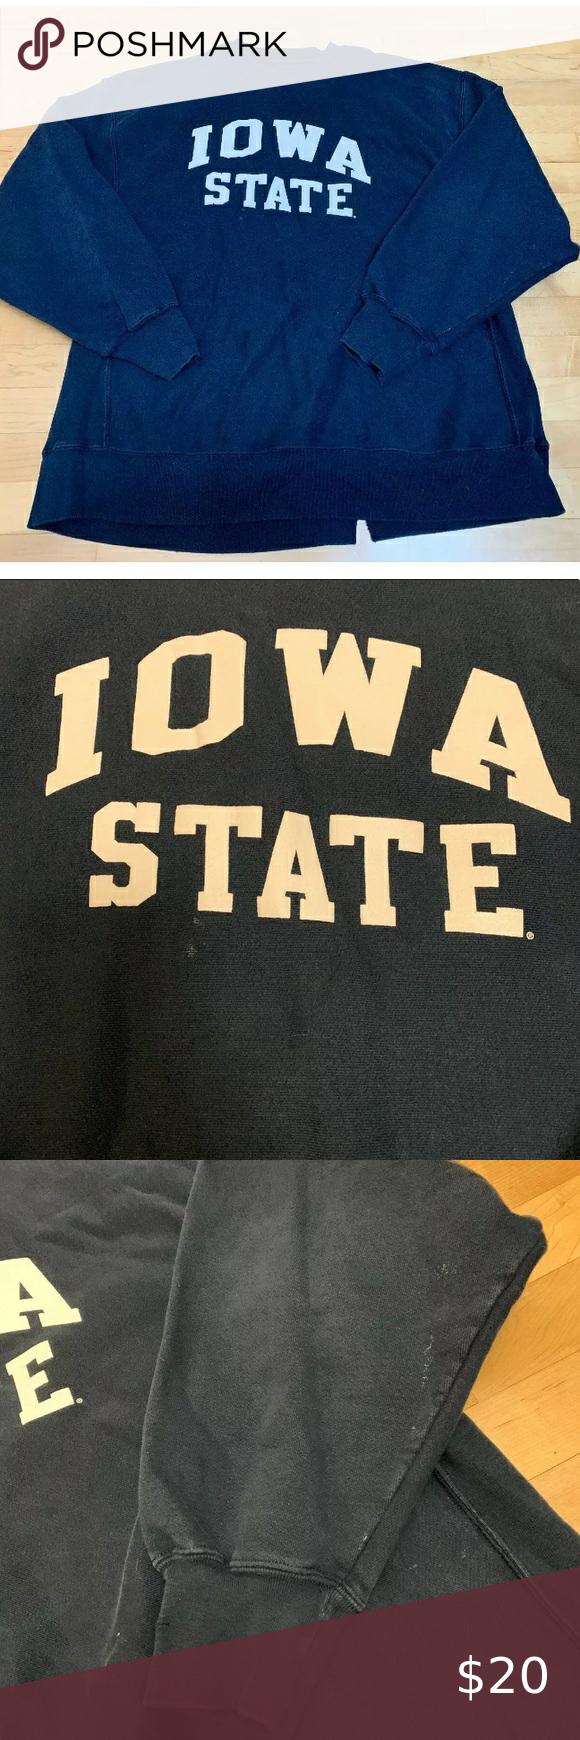 Champion Reverse Weave Iowa State Sweatshirt Champion Reverse Weave Iowa State University Cyclone In 2020 Champion Reverse Weave Iowa State University State Sweatshirt [ 1740 x 580 Pixel ]